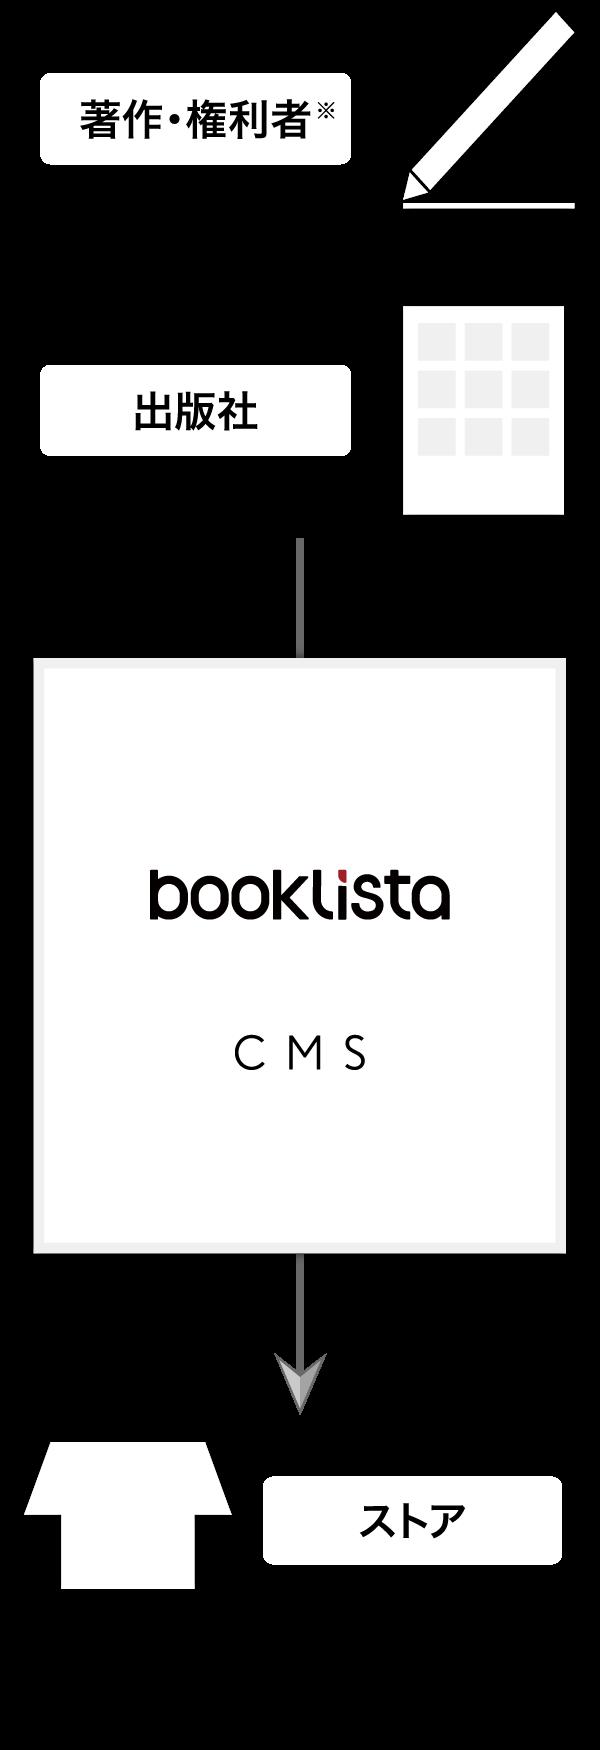 [booklista]